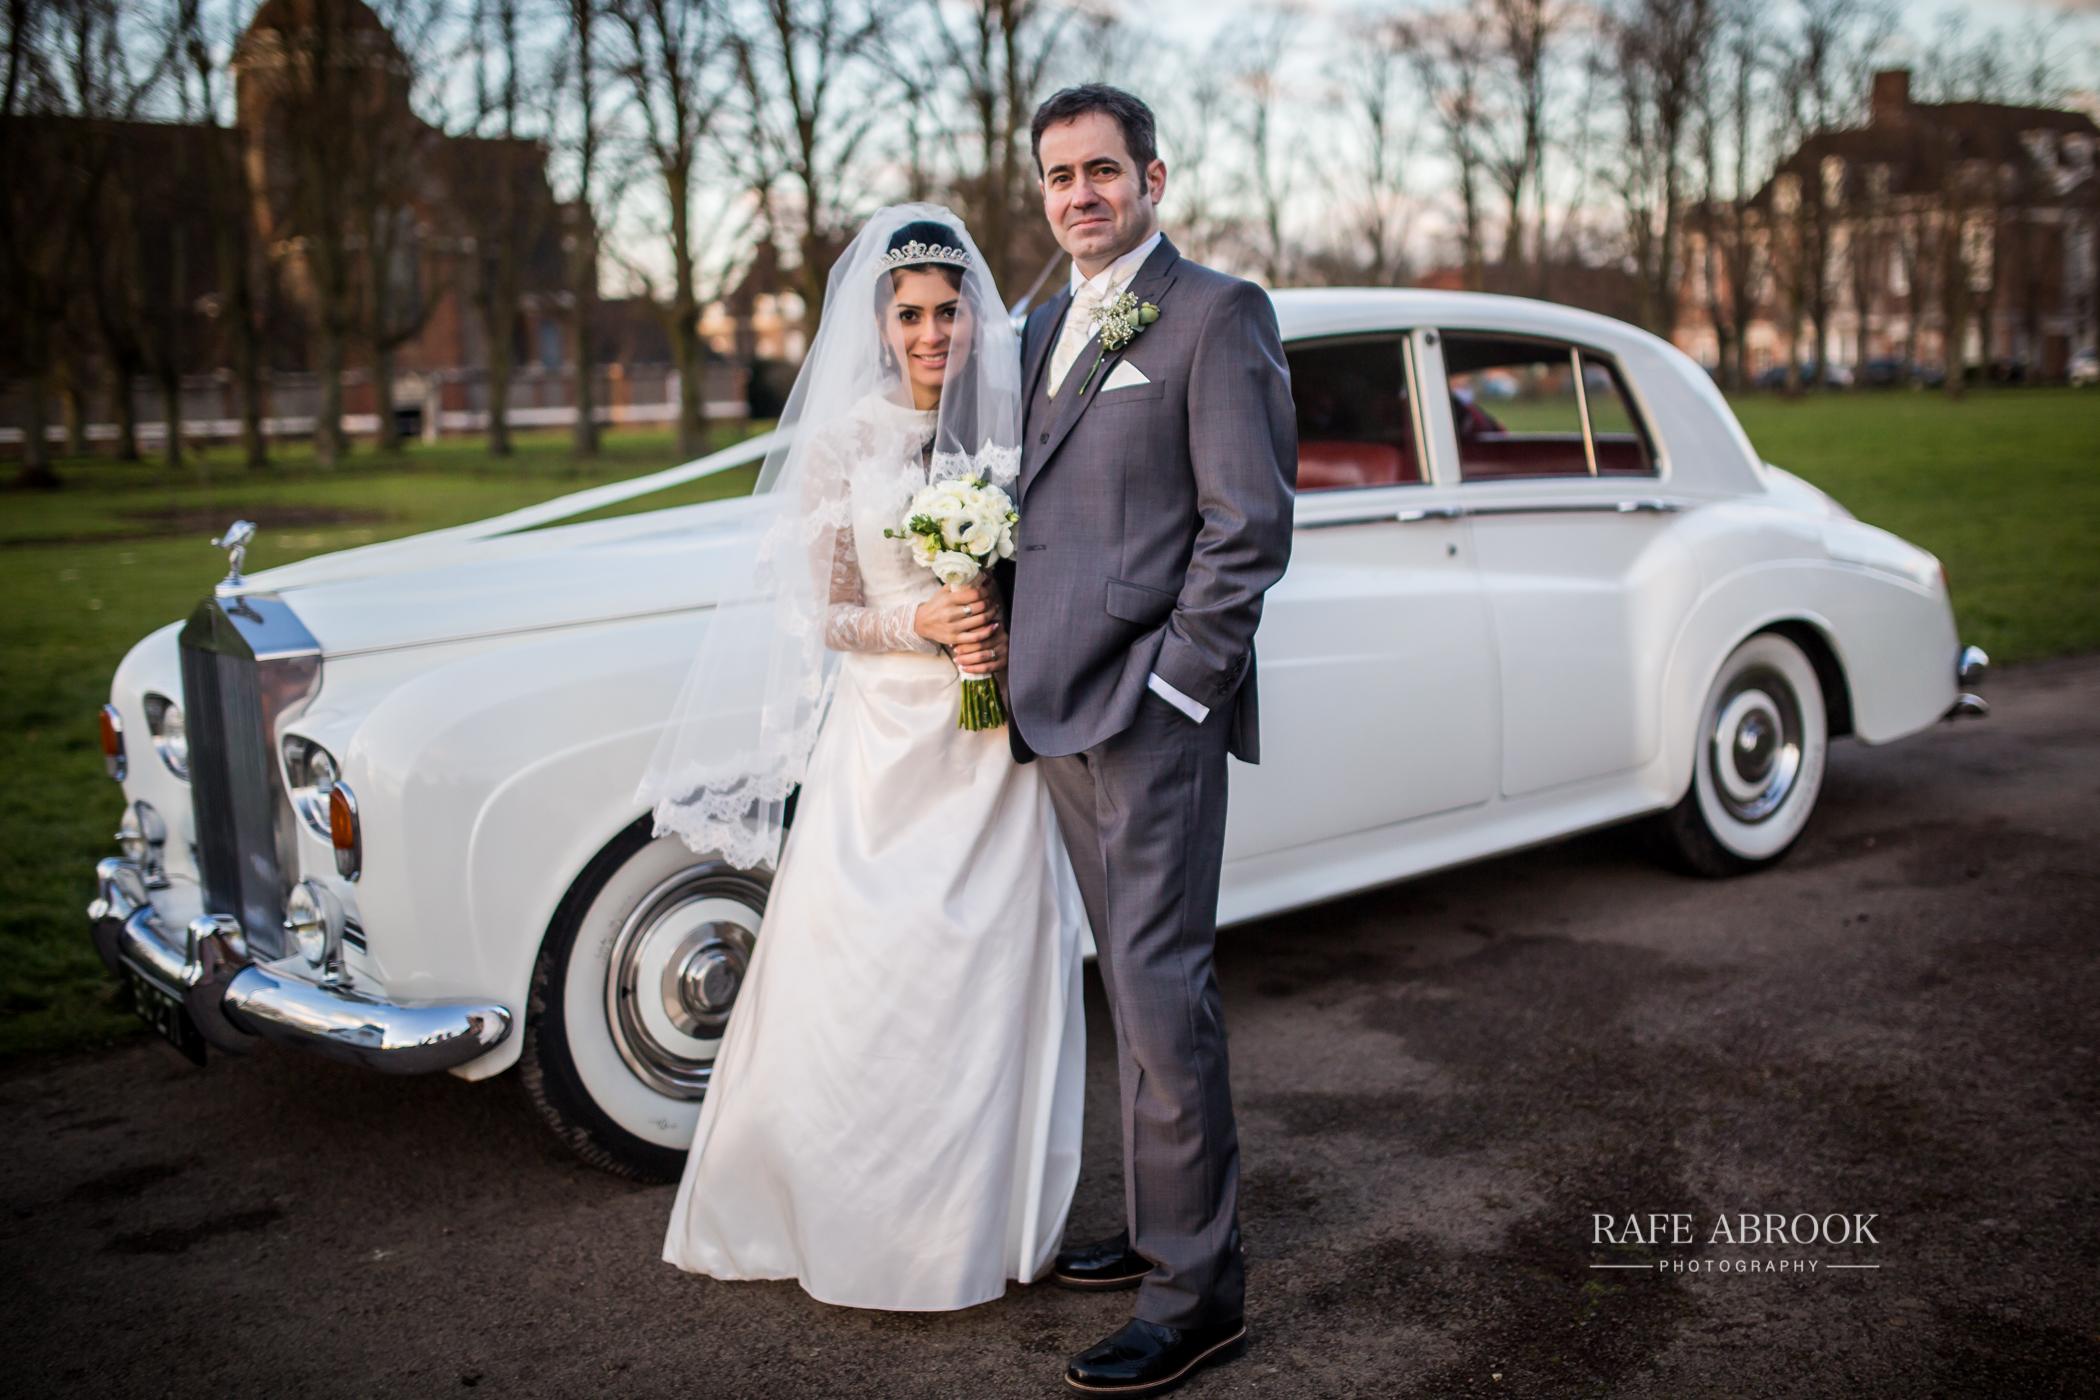 roma & pete wedding hampstead shenley hertfordshire -310.jpg